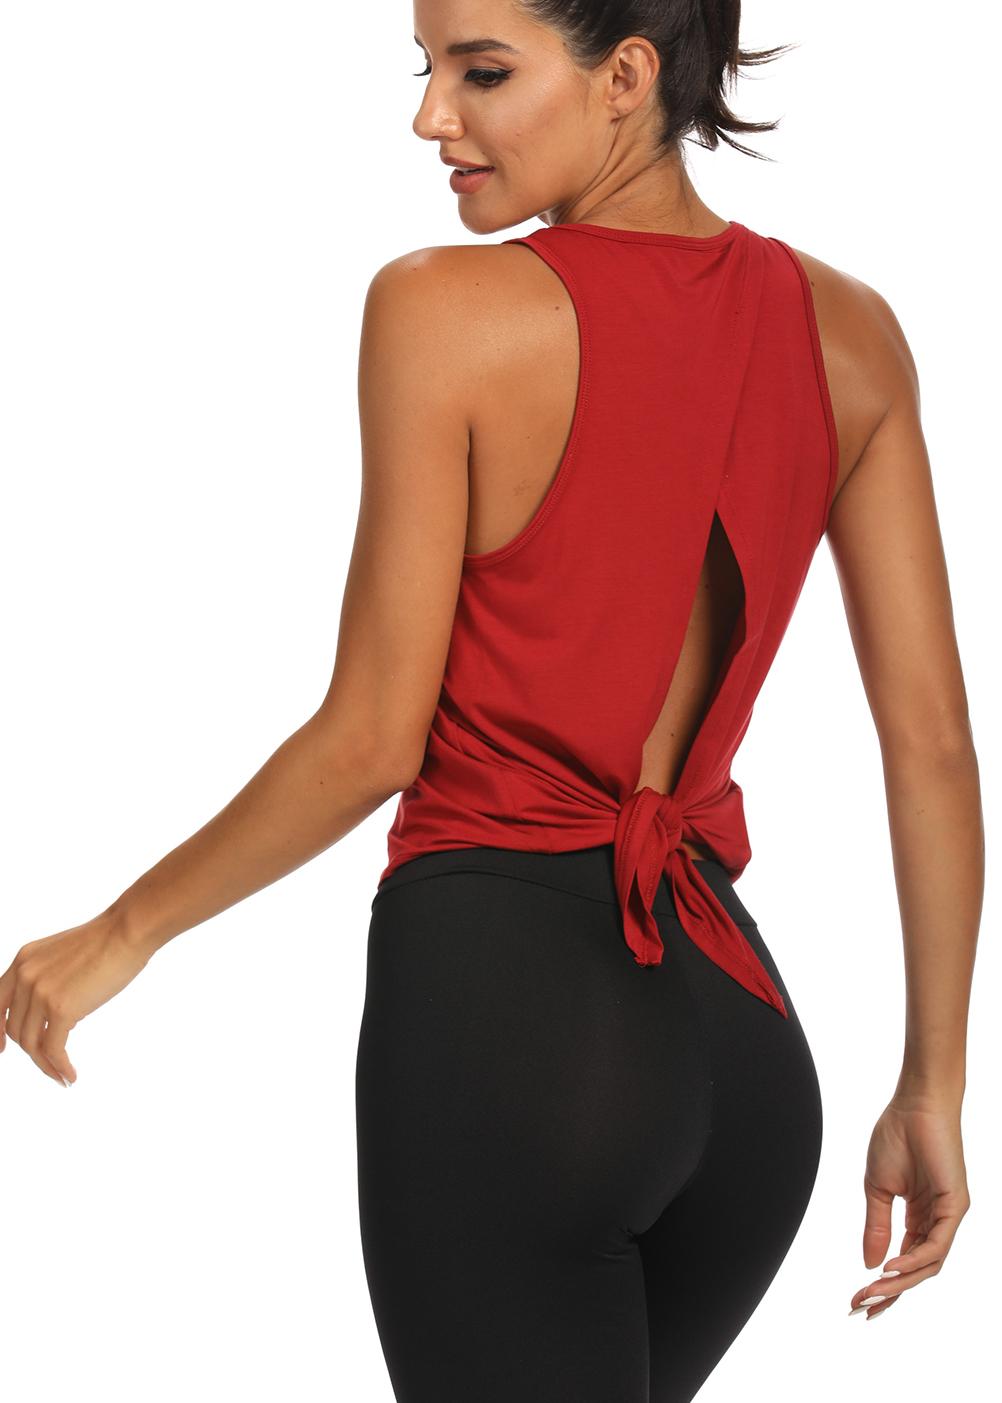 Bestisun-Open-Back-Workout-Tops-for-Women-Backless-Workout-Shirts-for-Women-Tie-Back-Yoga-Tank-for-Women